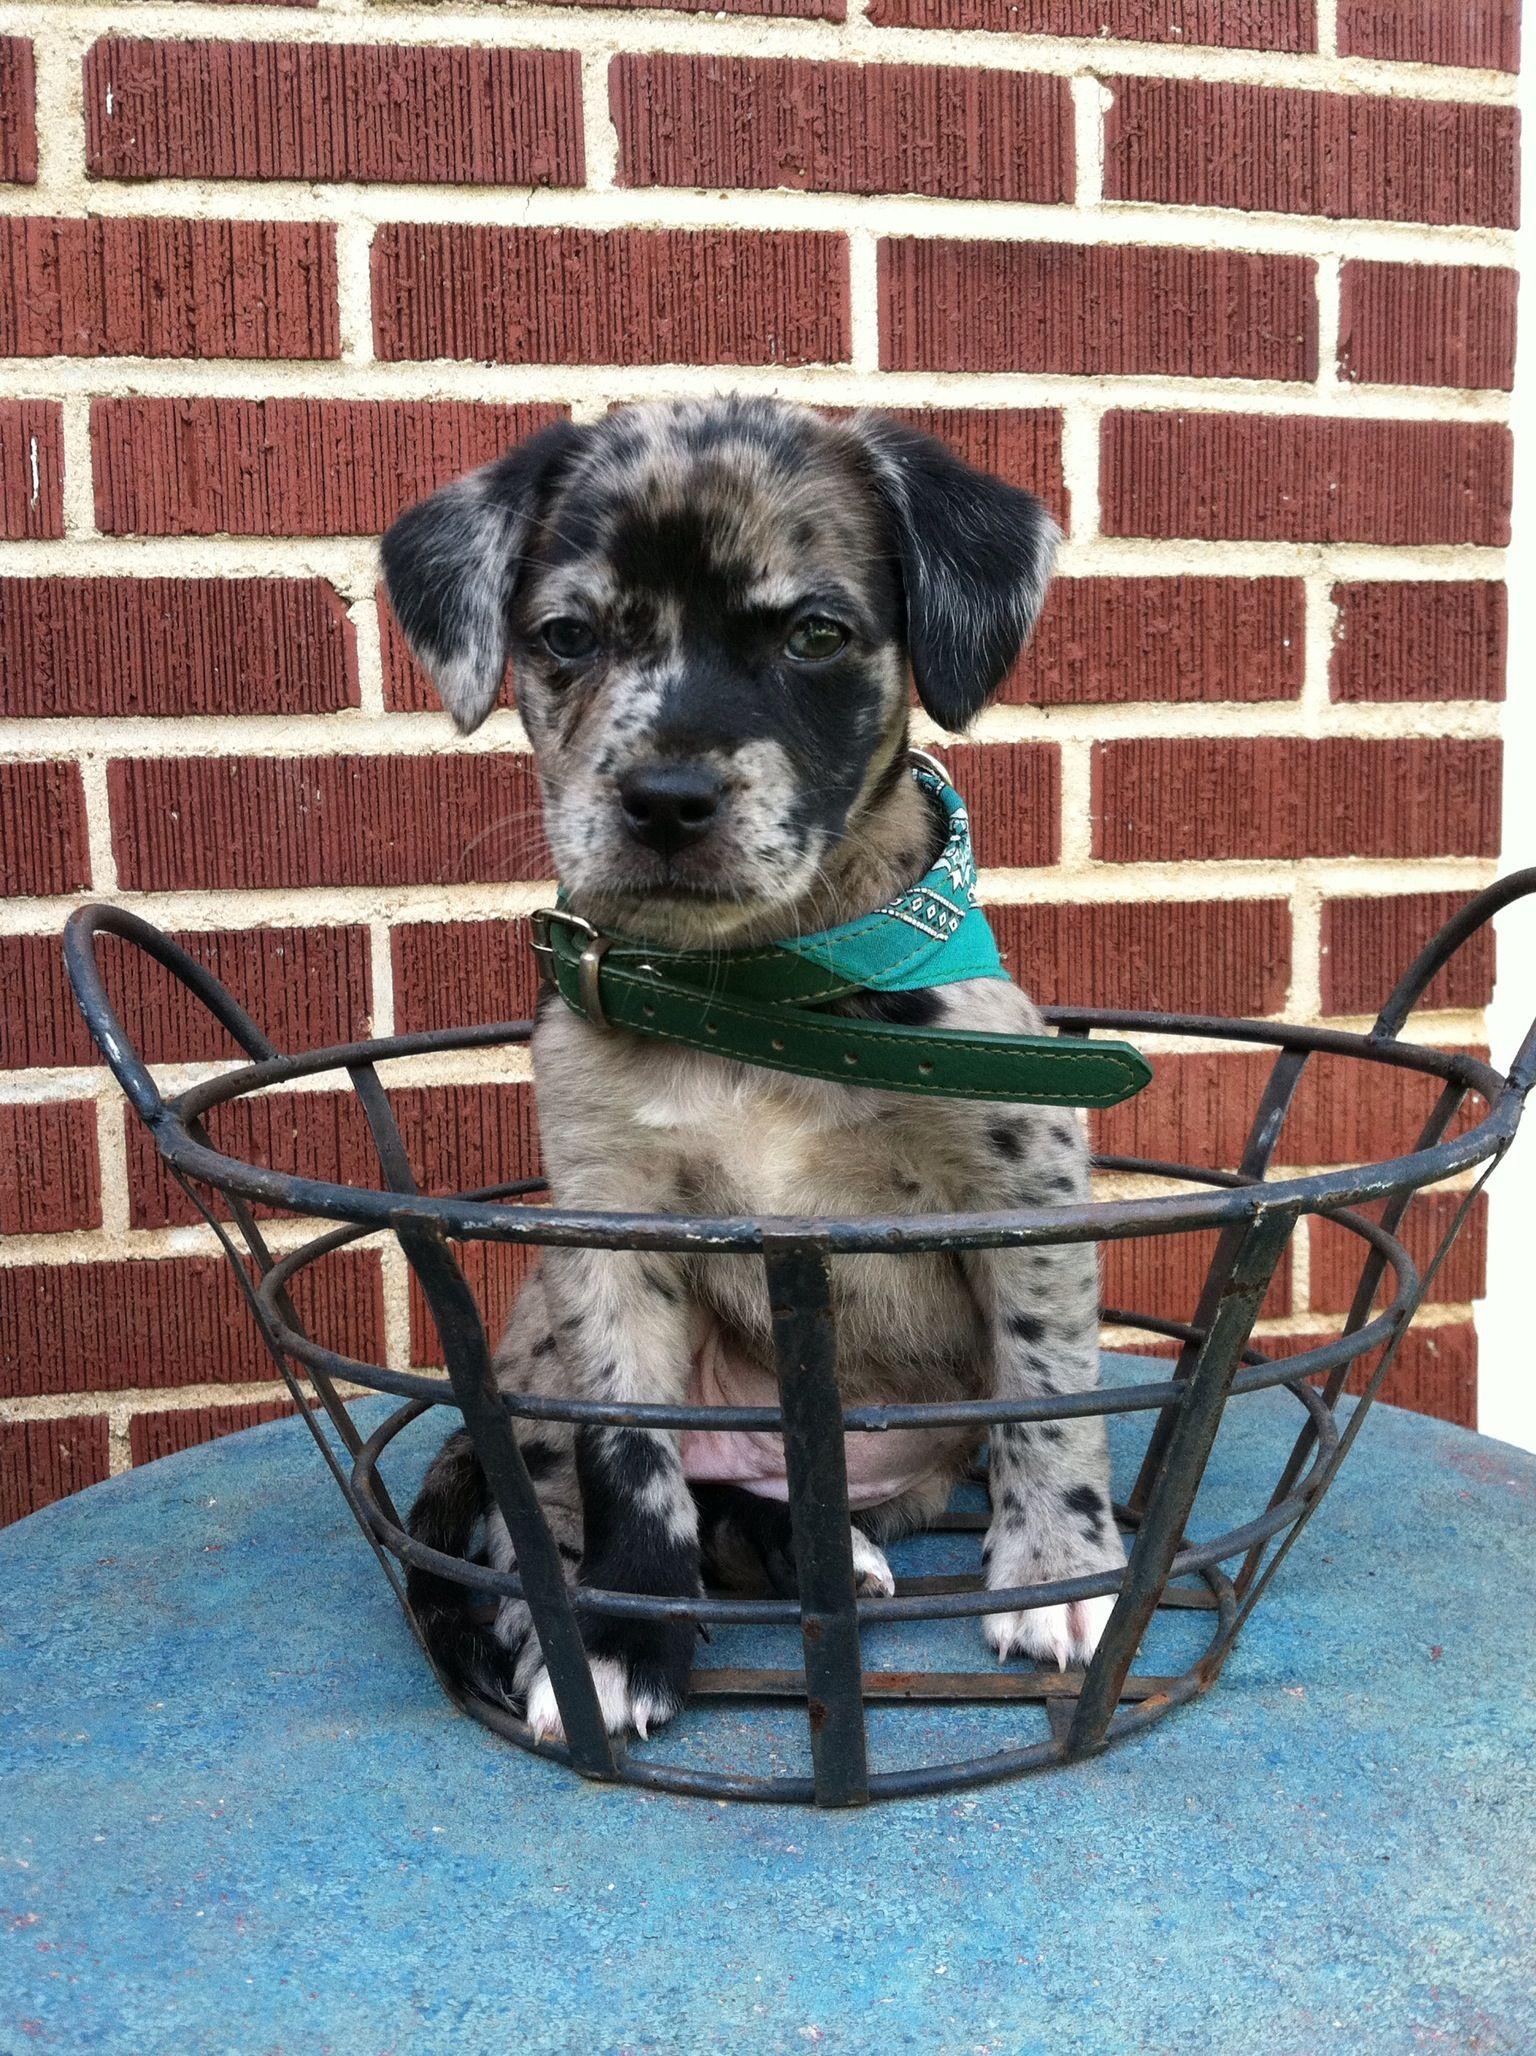 Pin By Ashlyn Burkholder On Furry Fluffy Feathery Love Australian Shepherd Lab Mix Blue Heeler Puppies Unique Dog Breeds